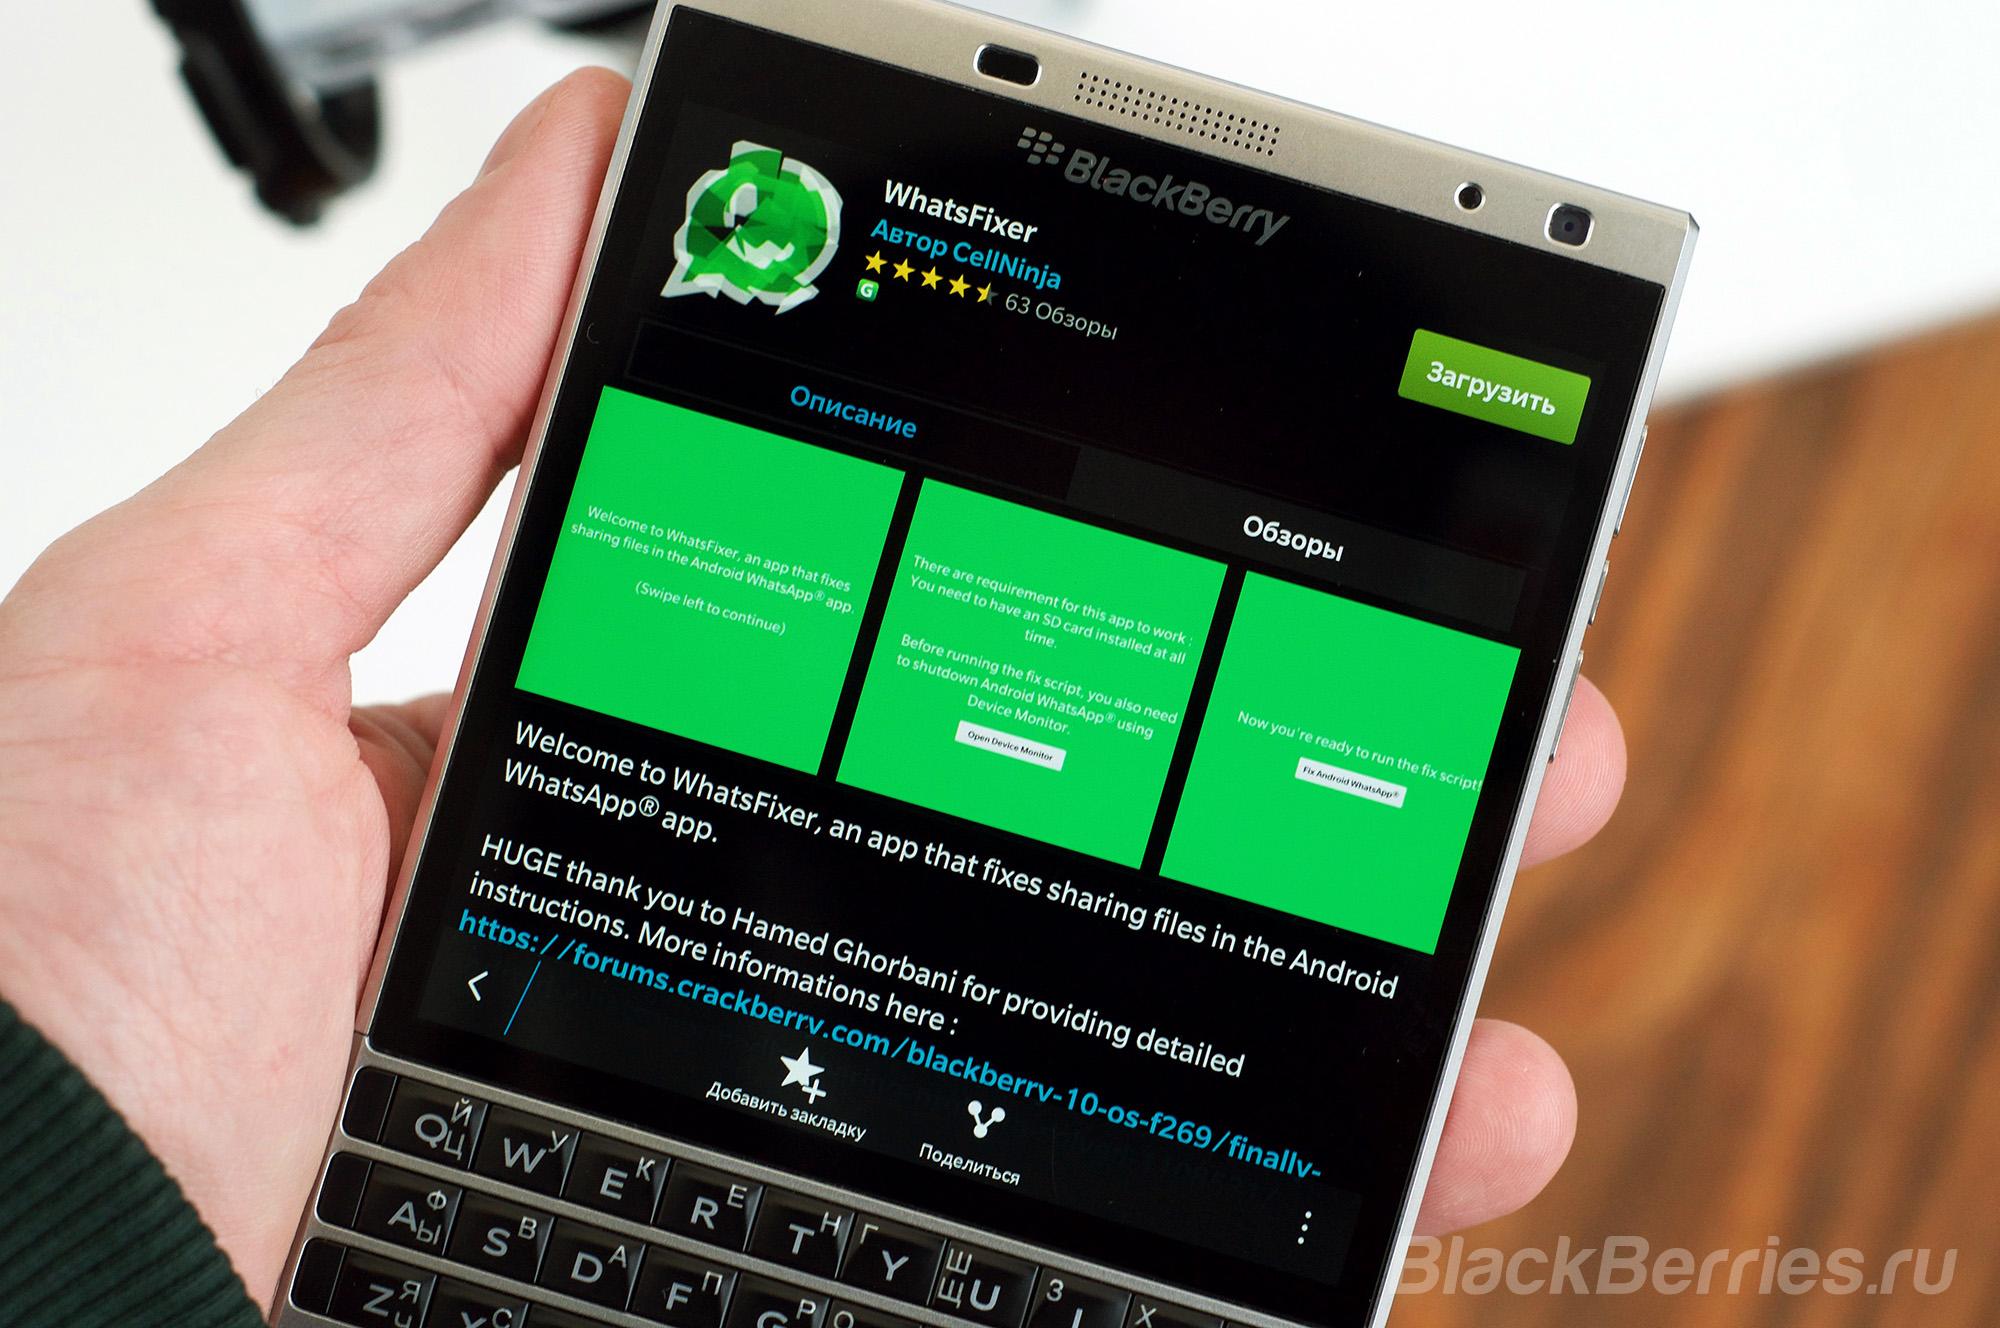 WhatsApp прекратил поддержку BlackBerry 10 и BBOS | BlackBerry в России